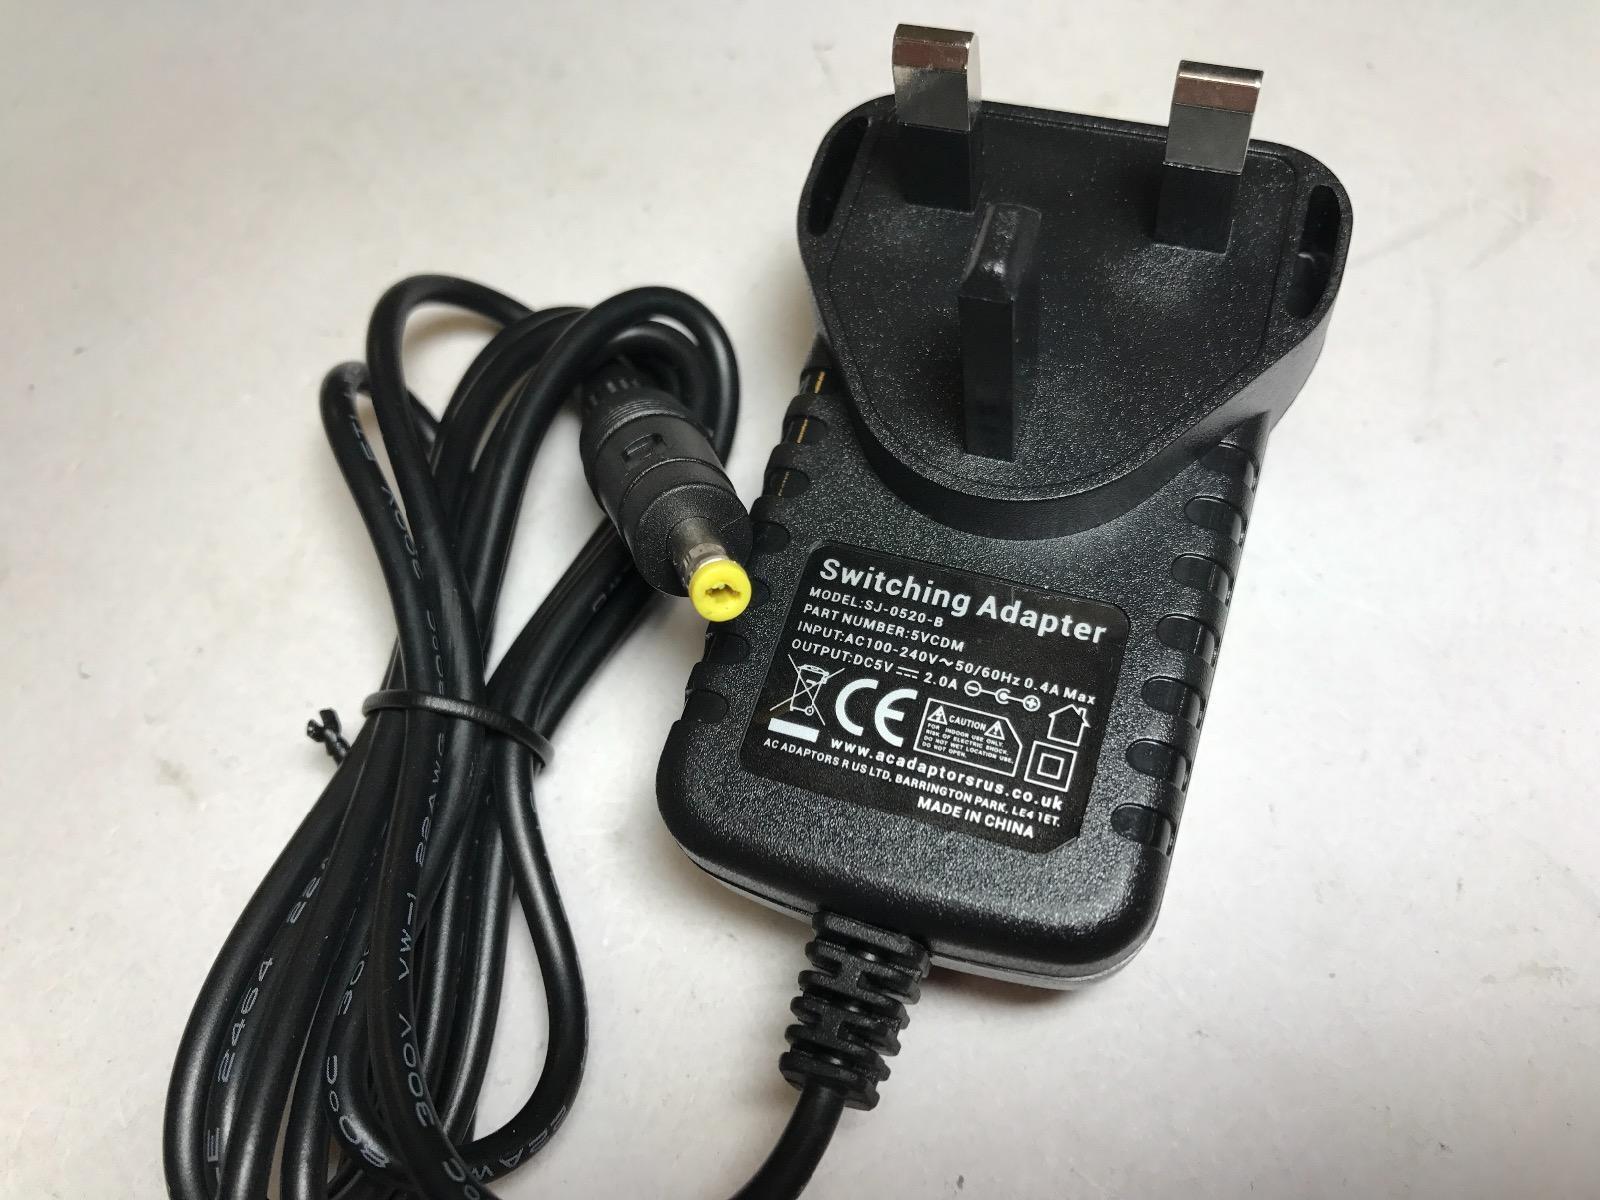 5V 2.0A 2A 2000mA AC-DC Switching Adaptor Power Supply 4.75x1.75 4.75mmx1.75mm